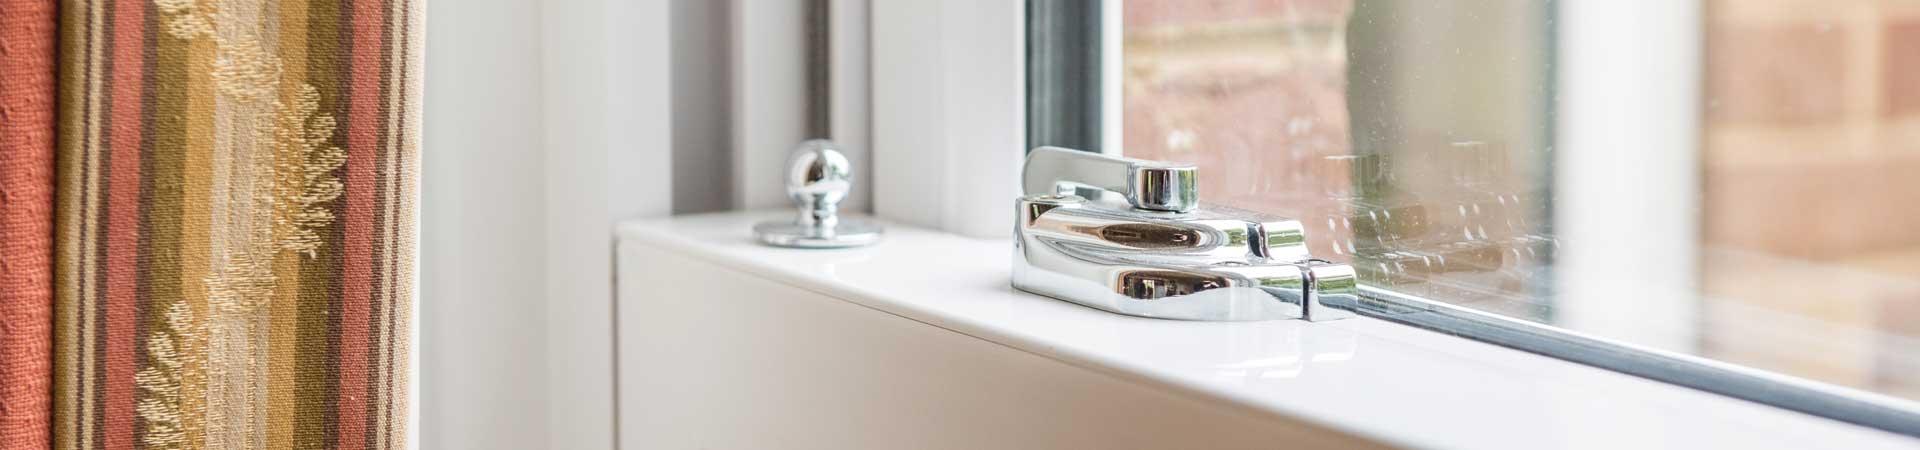 pvcu sash window lock image